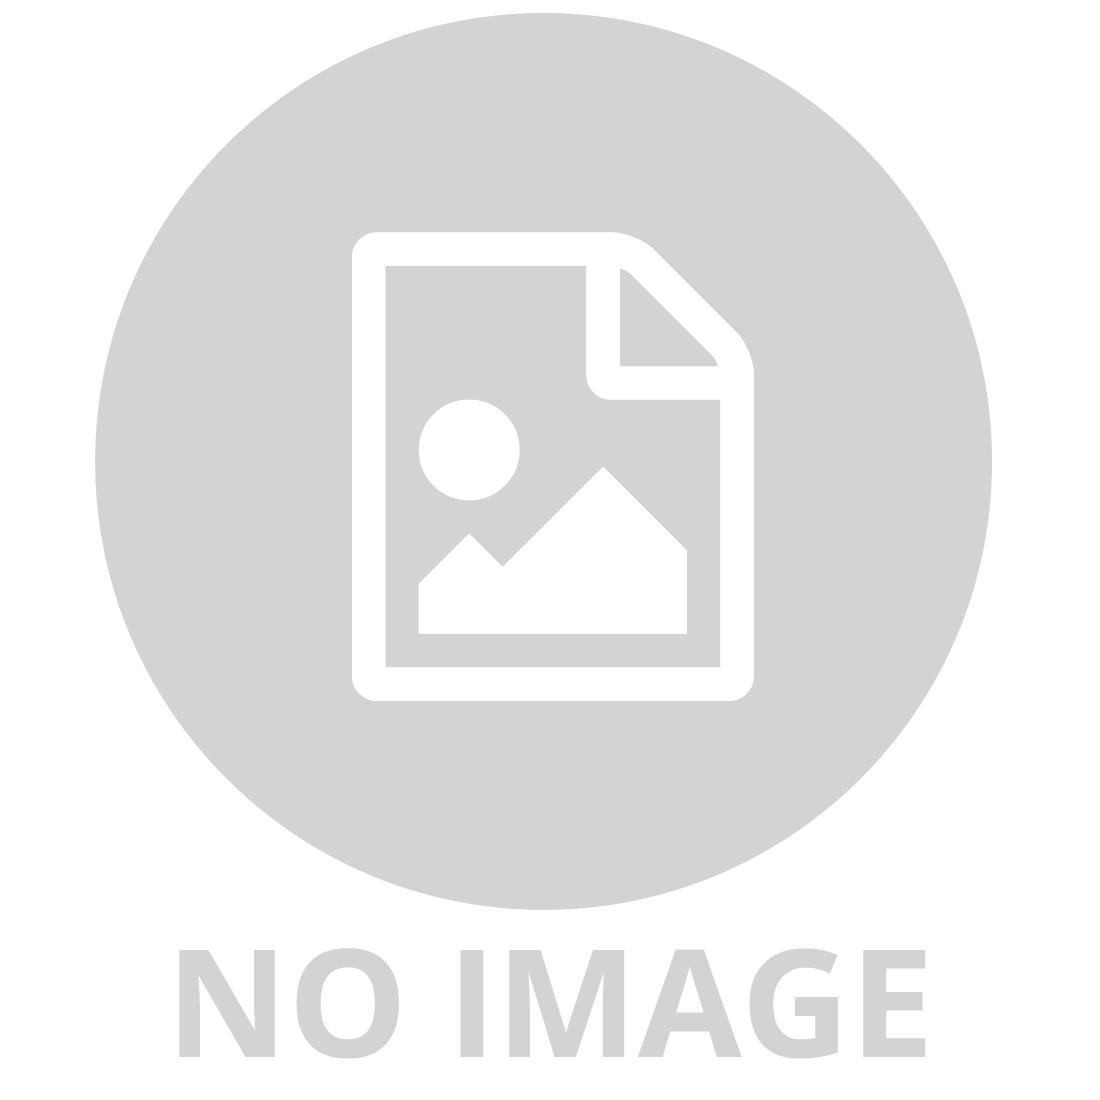 STARWARS GALAXY OF ADVENTURES  R2-D2